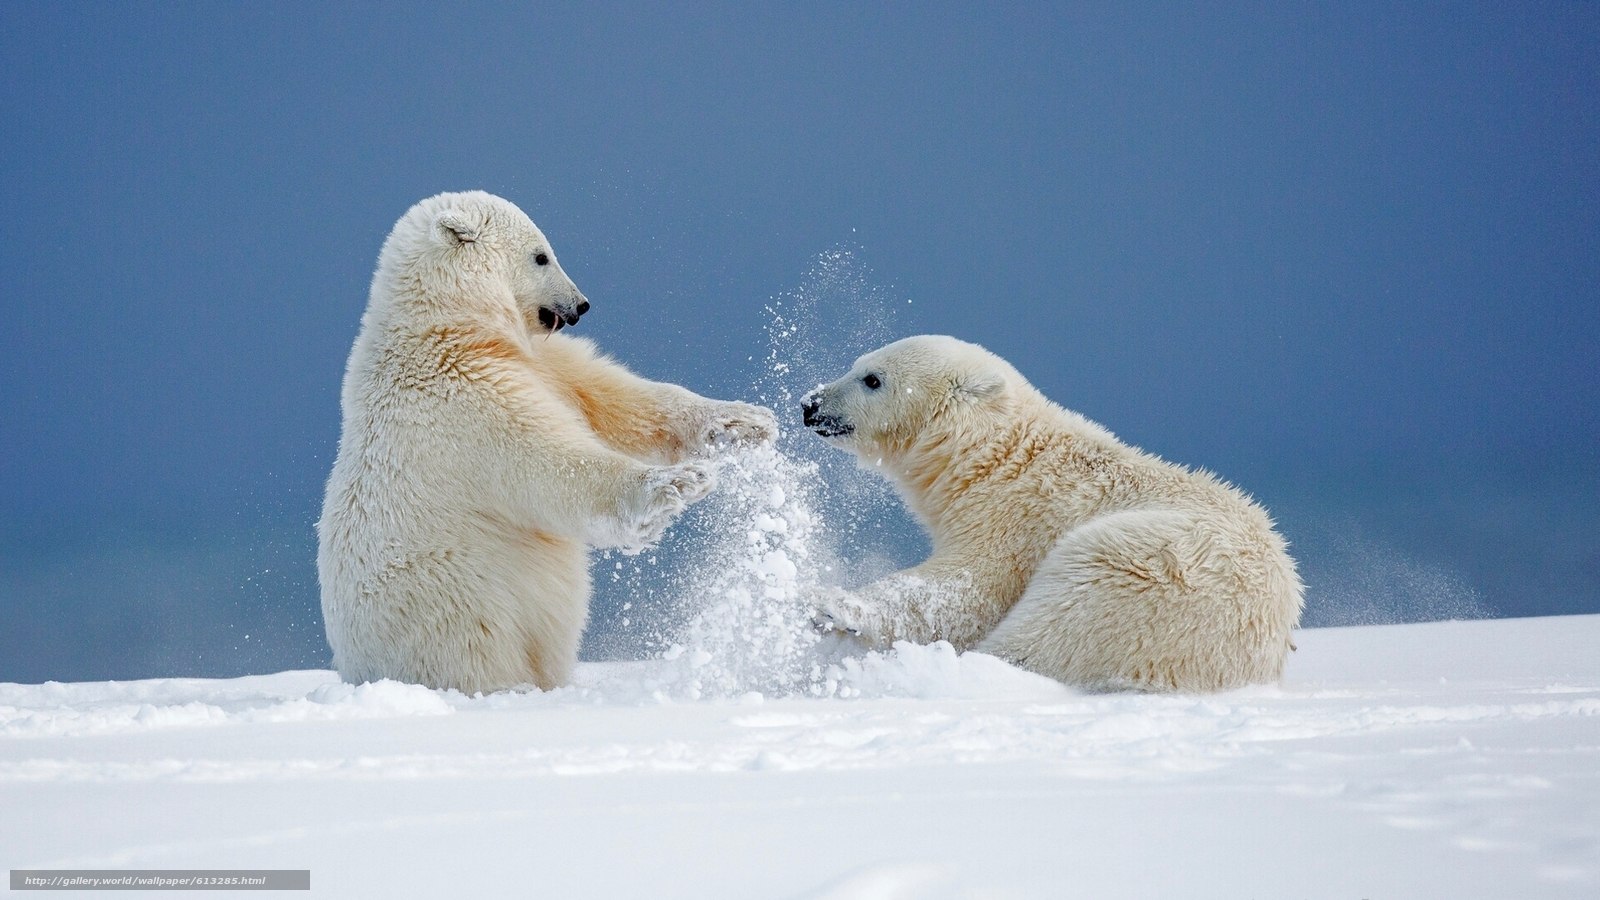 Tlcharger fond d 39 ecran ours polaires bears ours alaska for Sfondi gratis desktop inverno